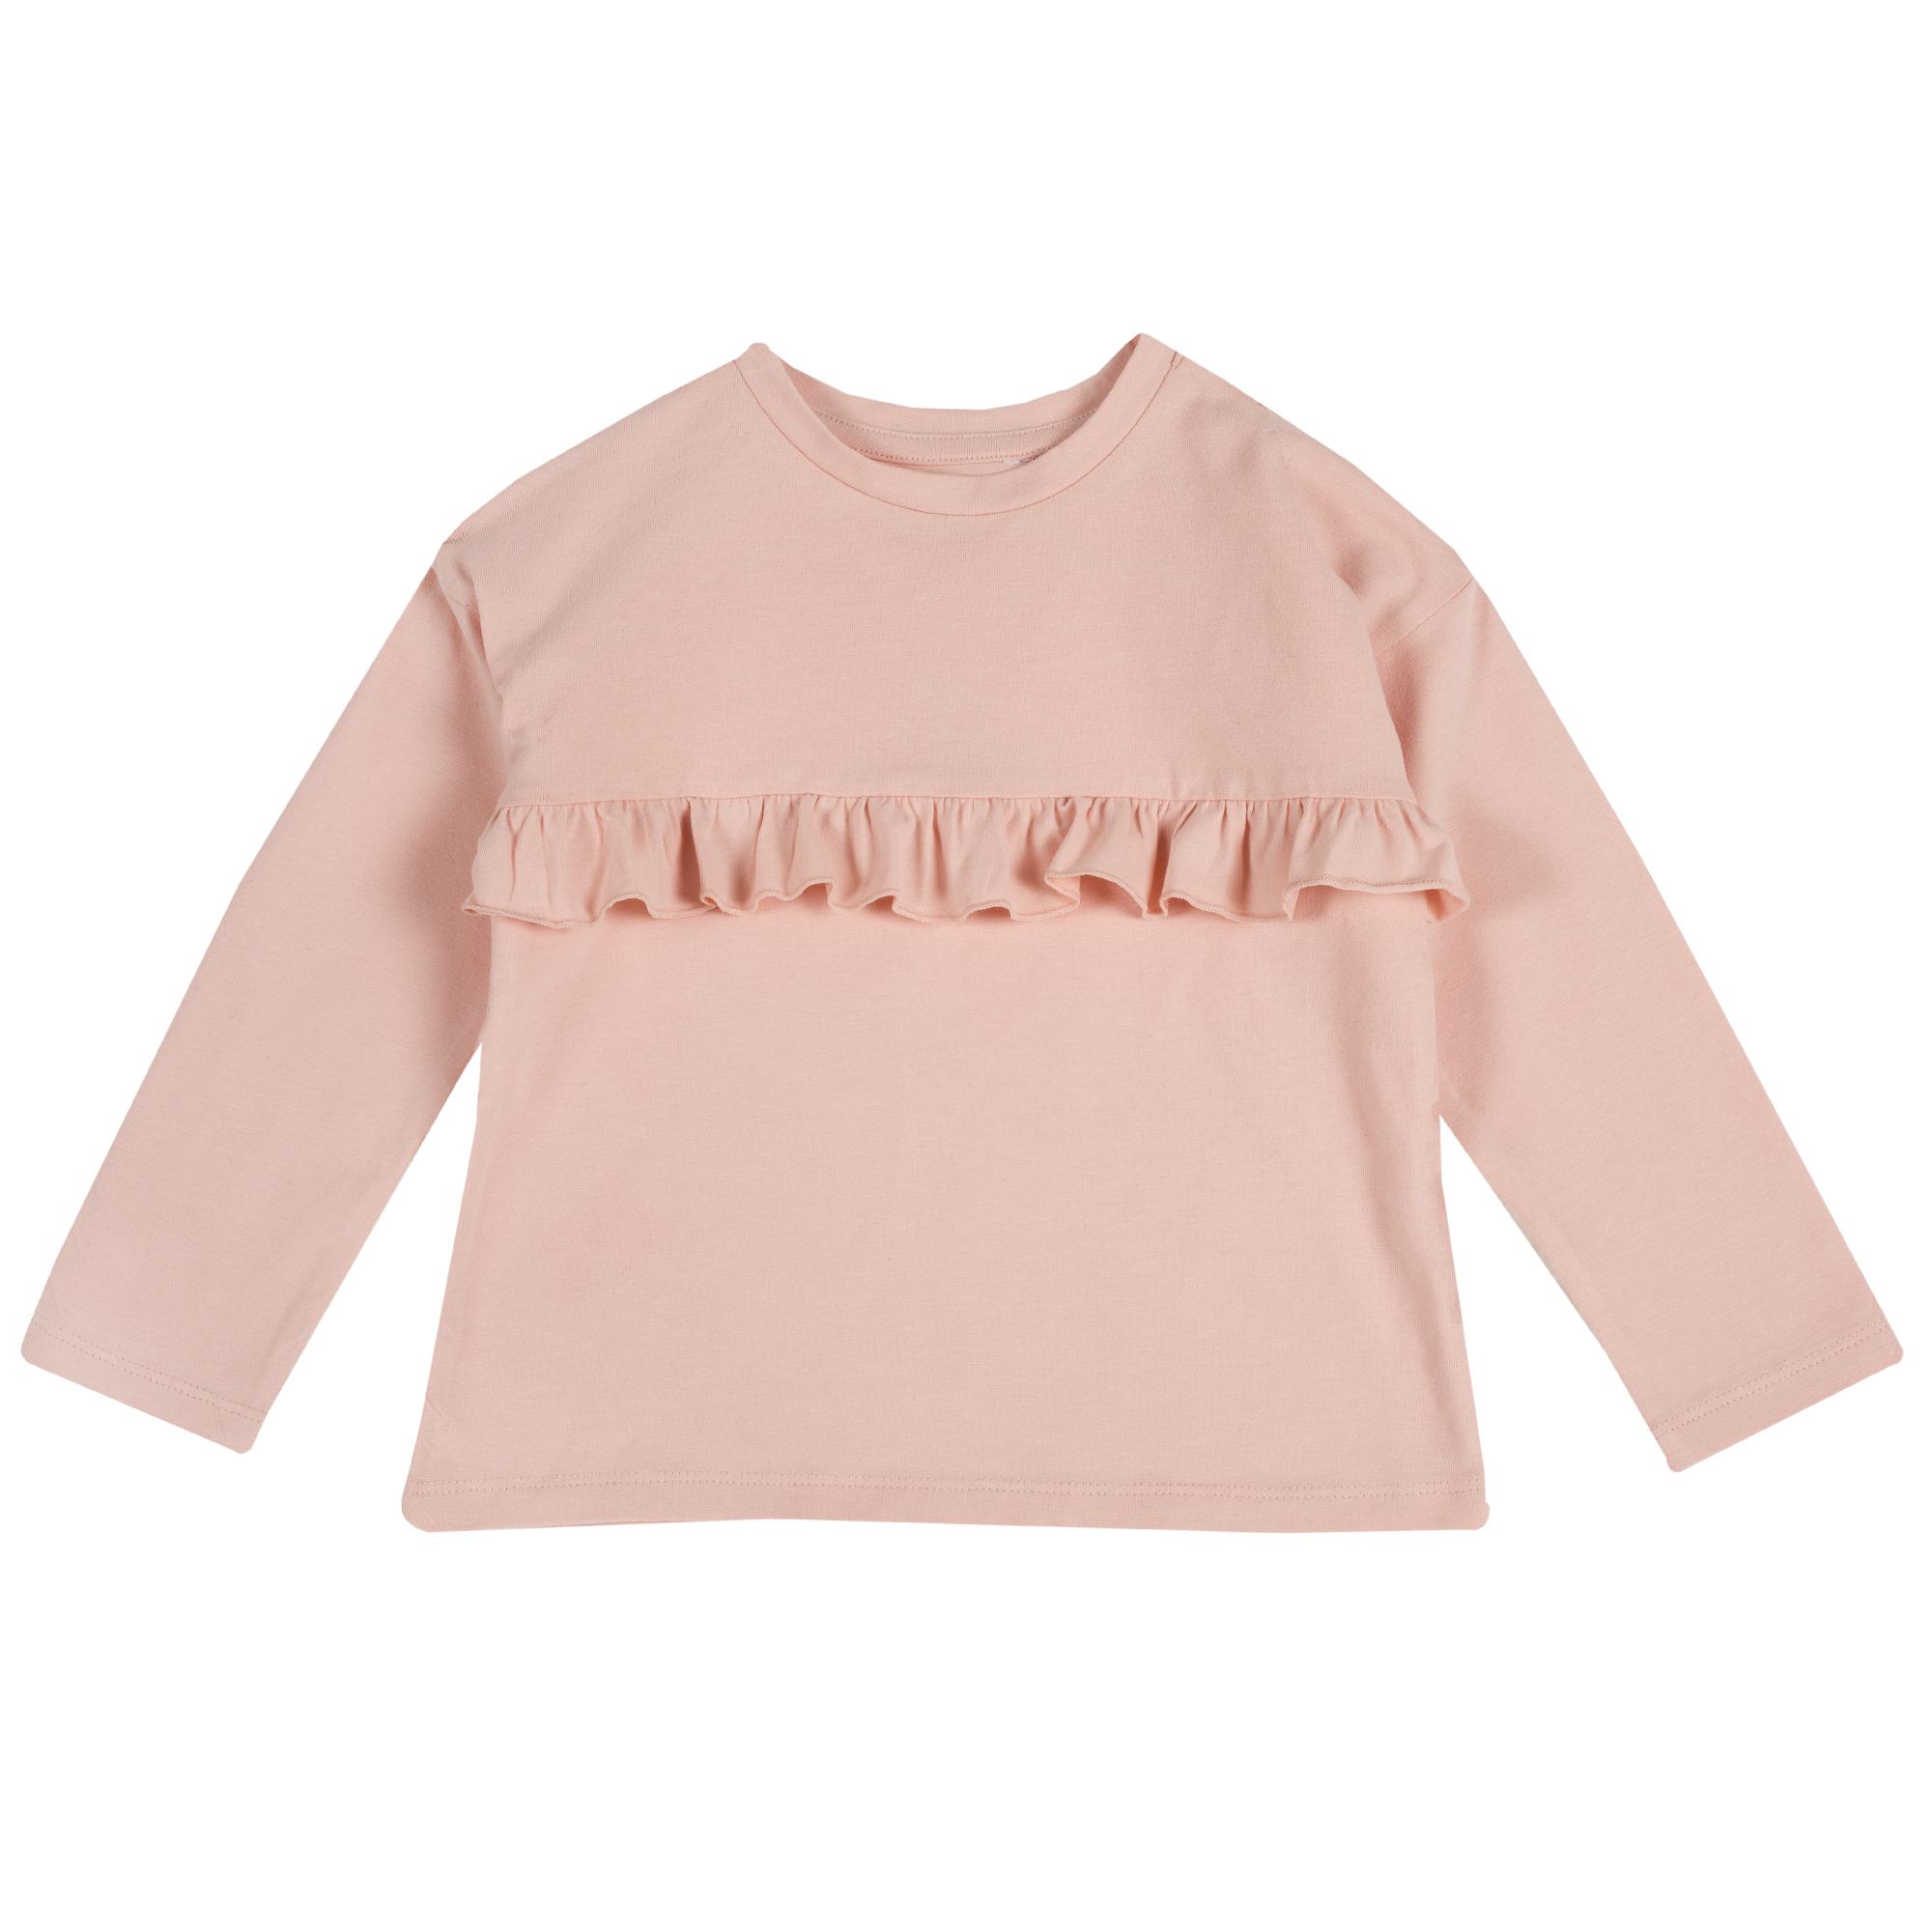 T-shirt Folho . 14,99€